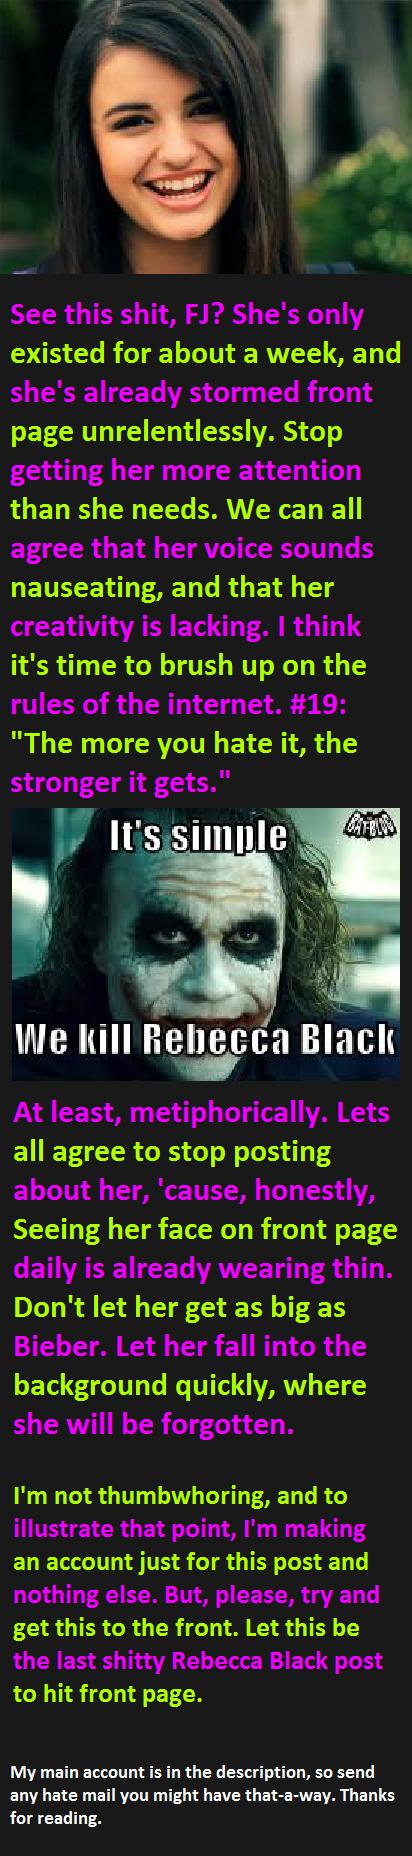 No more, FJ. No more.. www.funnyjunk.com/user/catmanjoseph ^^^ My main account. I'm really sick of lame Rebecca Black jokes hitting front. It's like JB all over